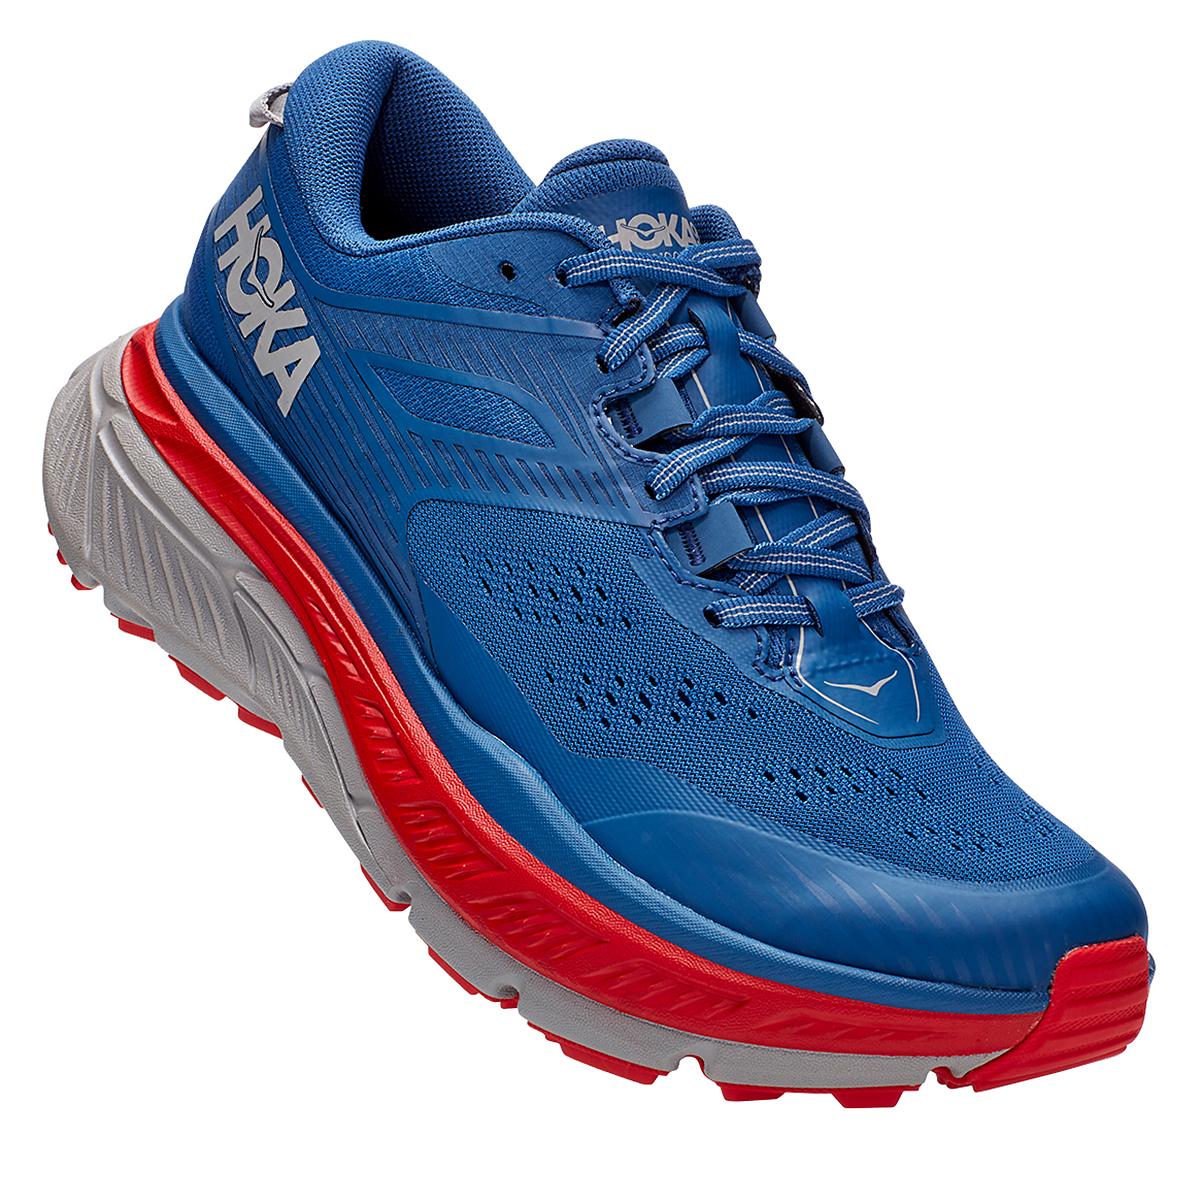 Men's Hoka One One Stinson Atr 6 Trail Running Shoe - Color: Dark Blue/High Risk Red - Size: 7 - Width: Regular, Dark Blue/High Risk Red, large, image 4